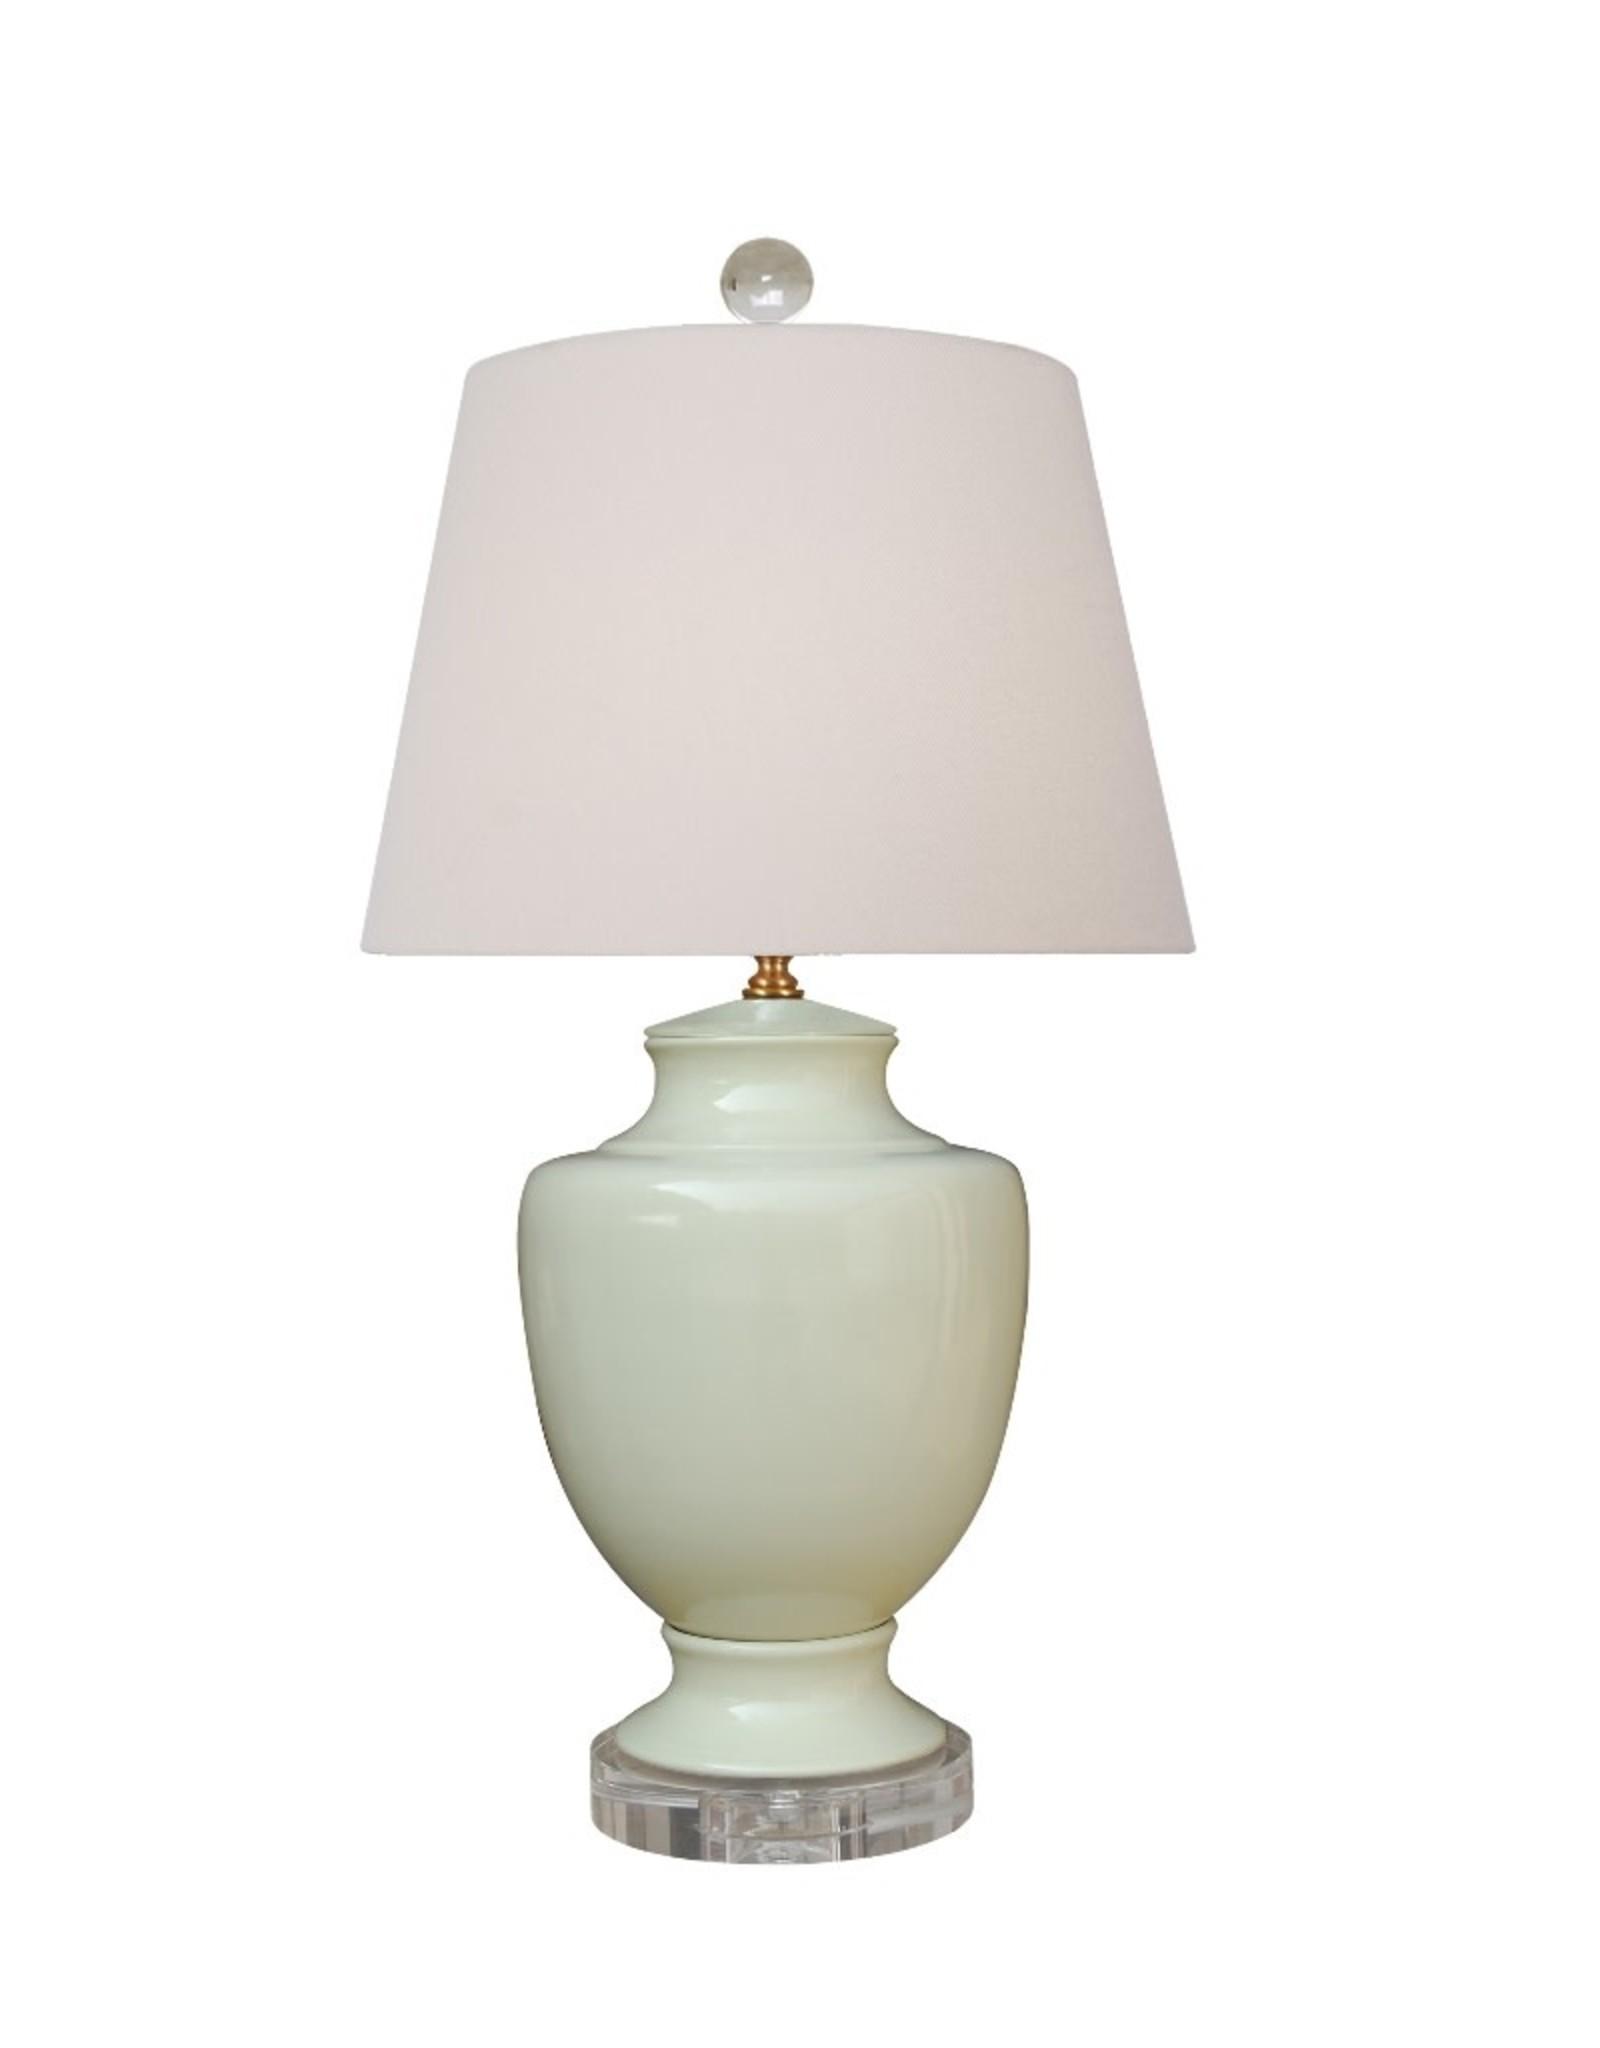 Oak + Arrow Interiors Creamy Porcelain Table Lamp